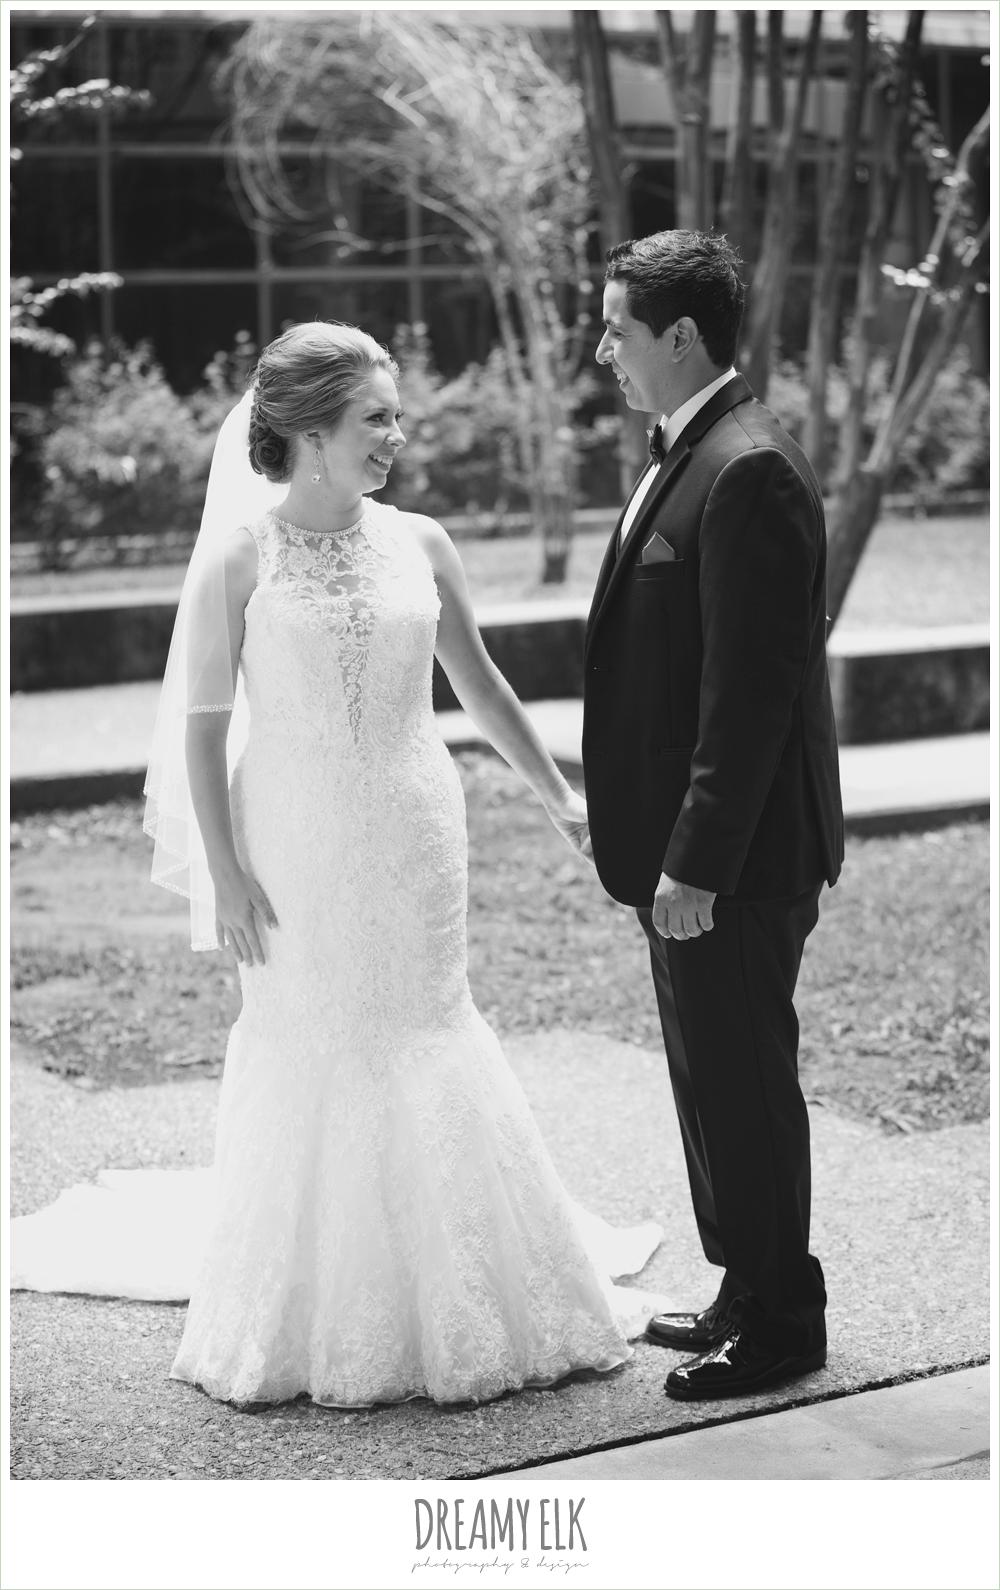 megan & andy, the wedding photo contest